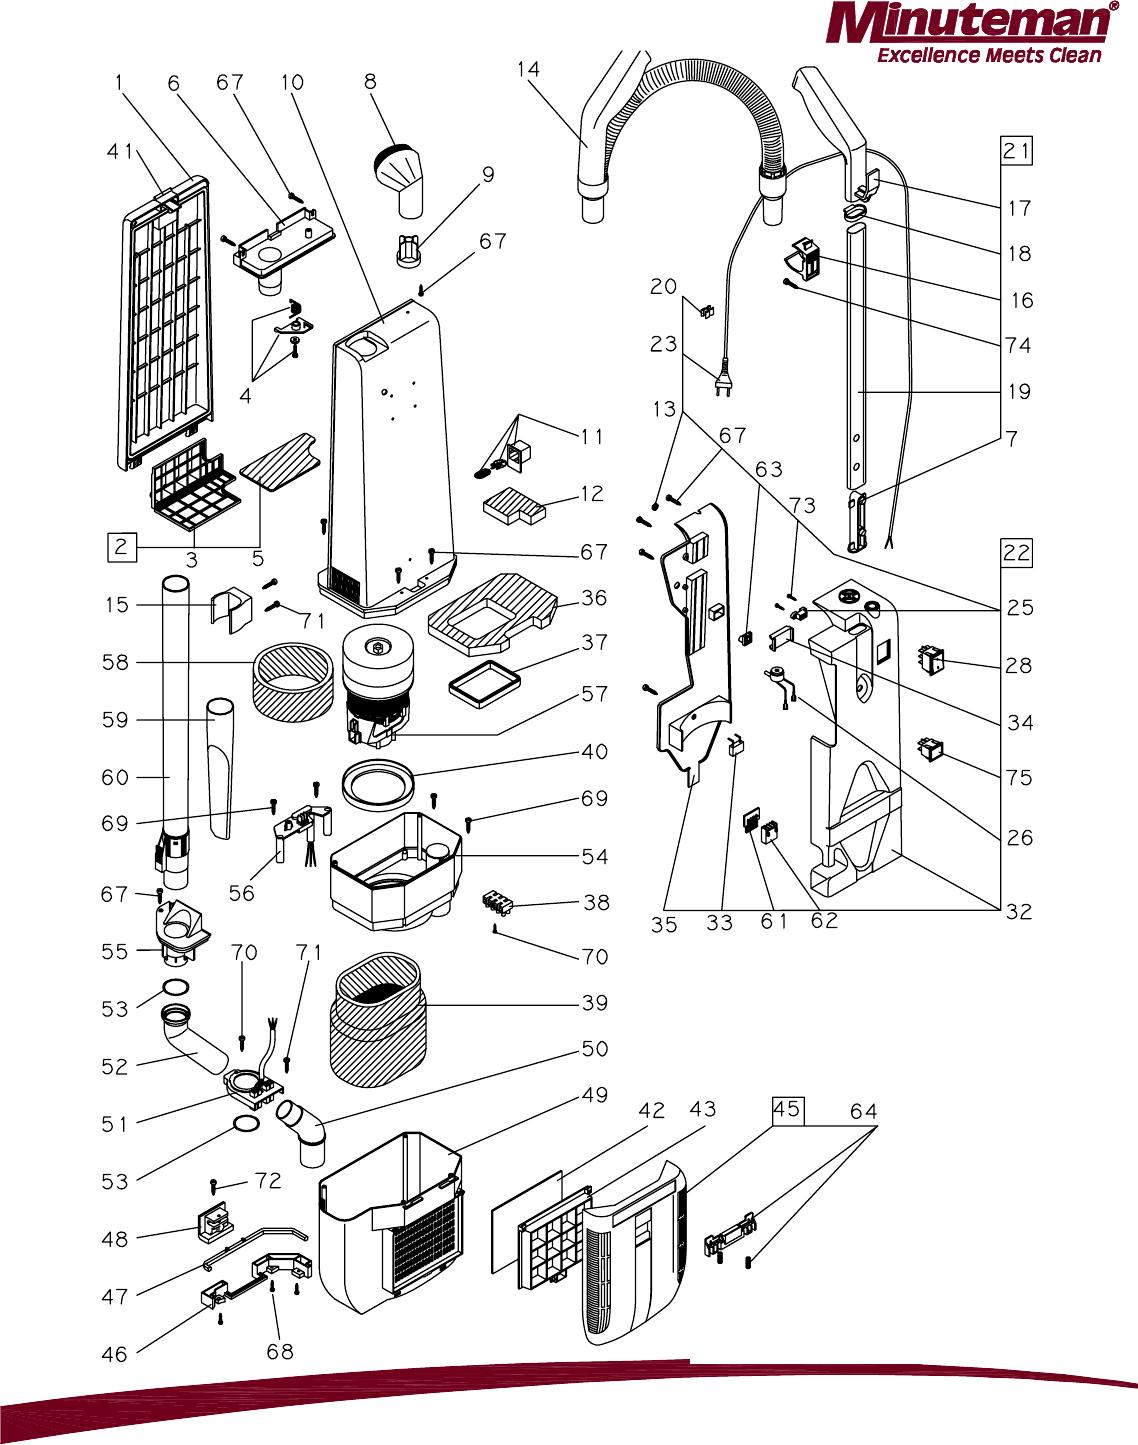 988743 Parts Manual Phenom L1518 Upright Vac REV STAR 0212